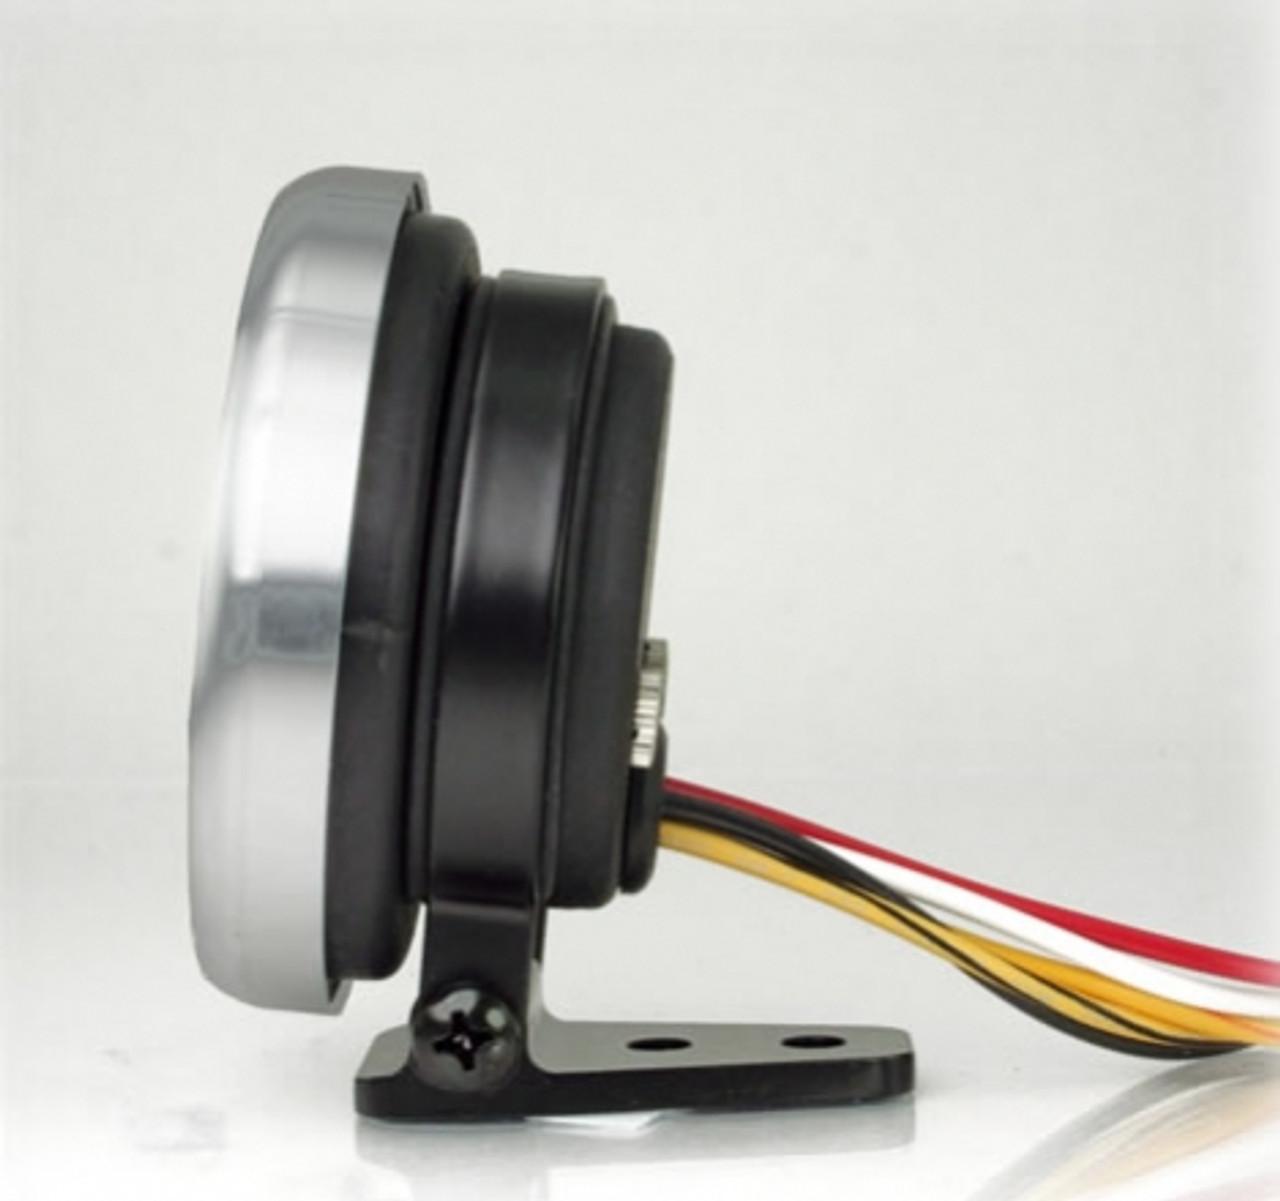 2-1/16 inch & 2-5/8 inch Gauge mounting bracket pedestal mount